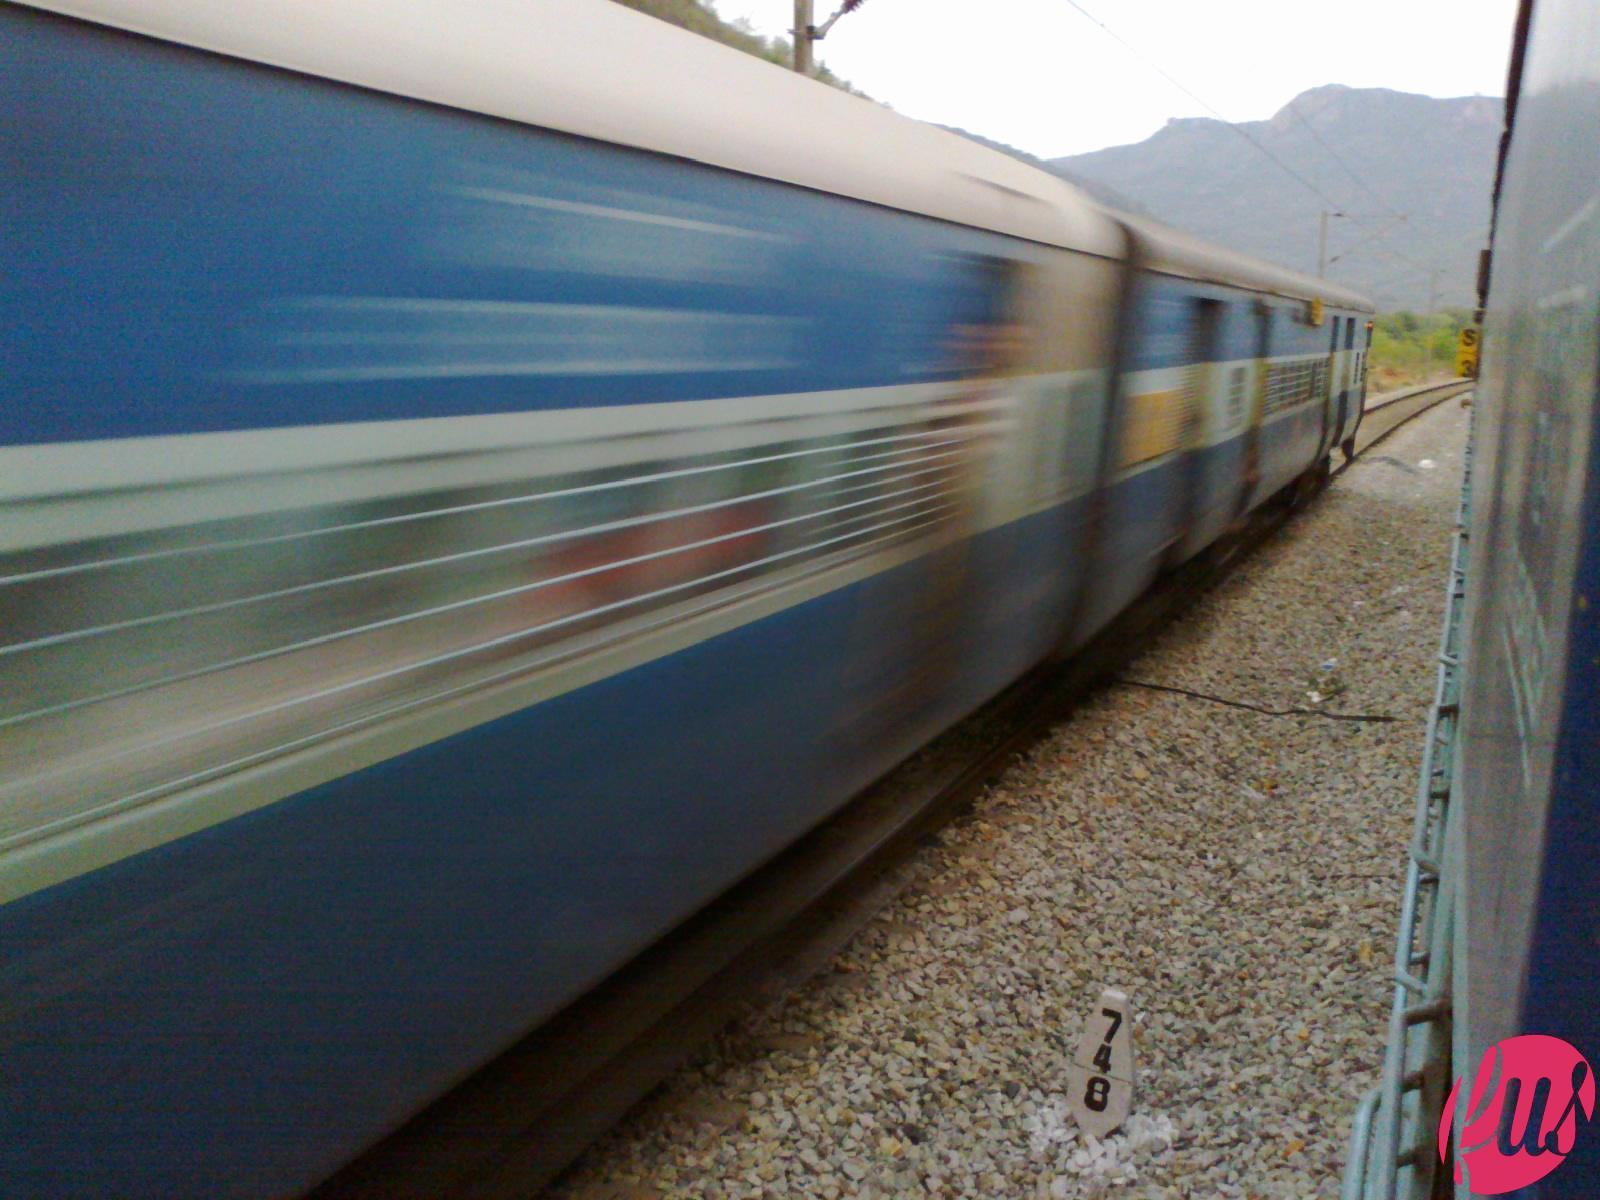 Fast_Moving_Train_India